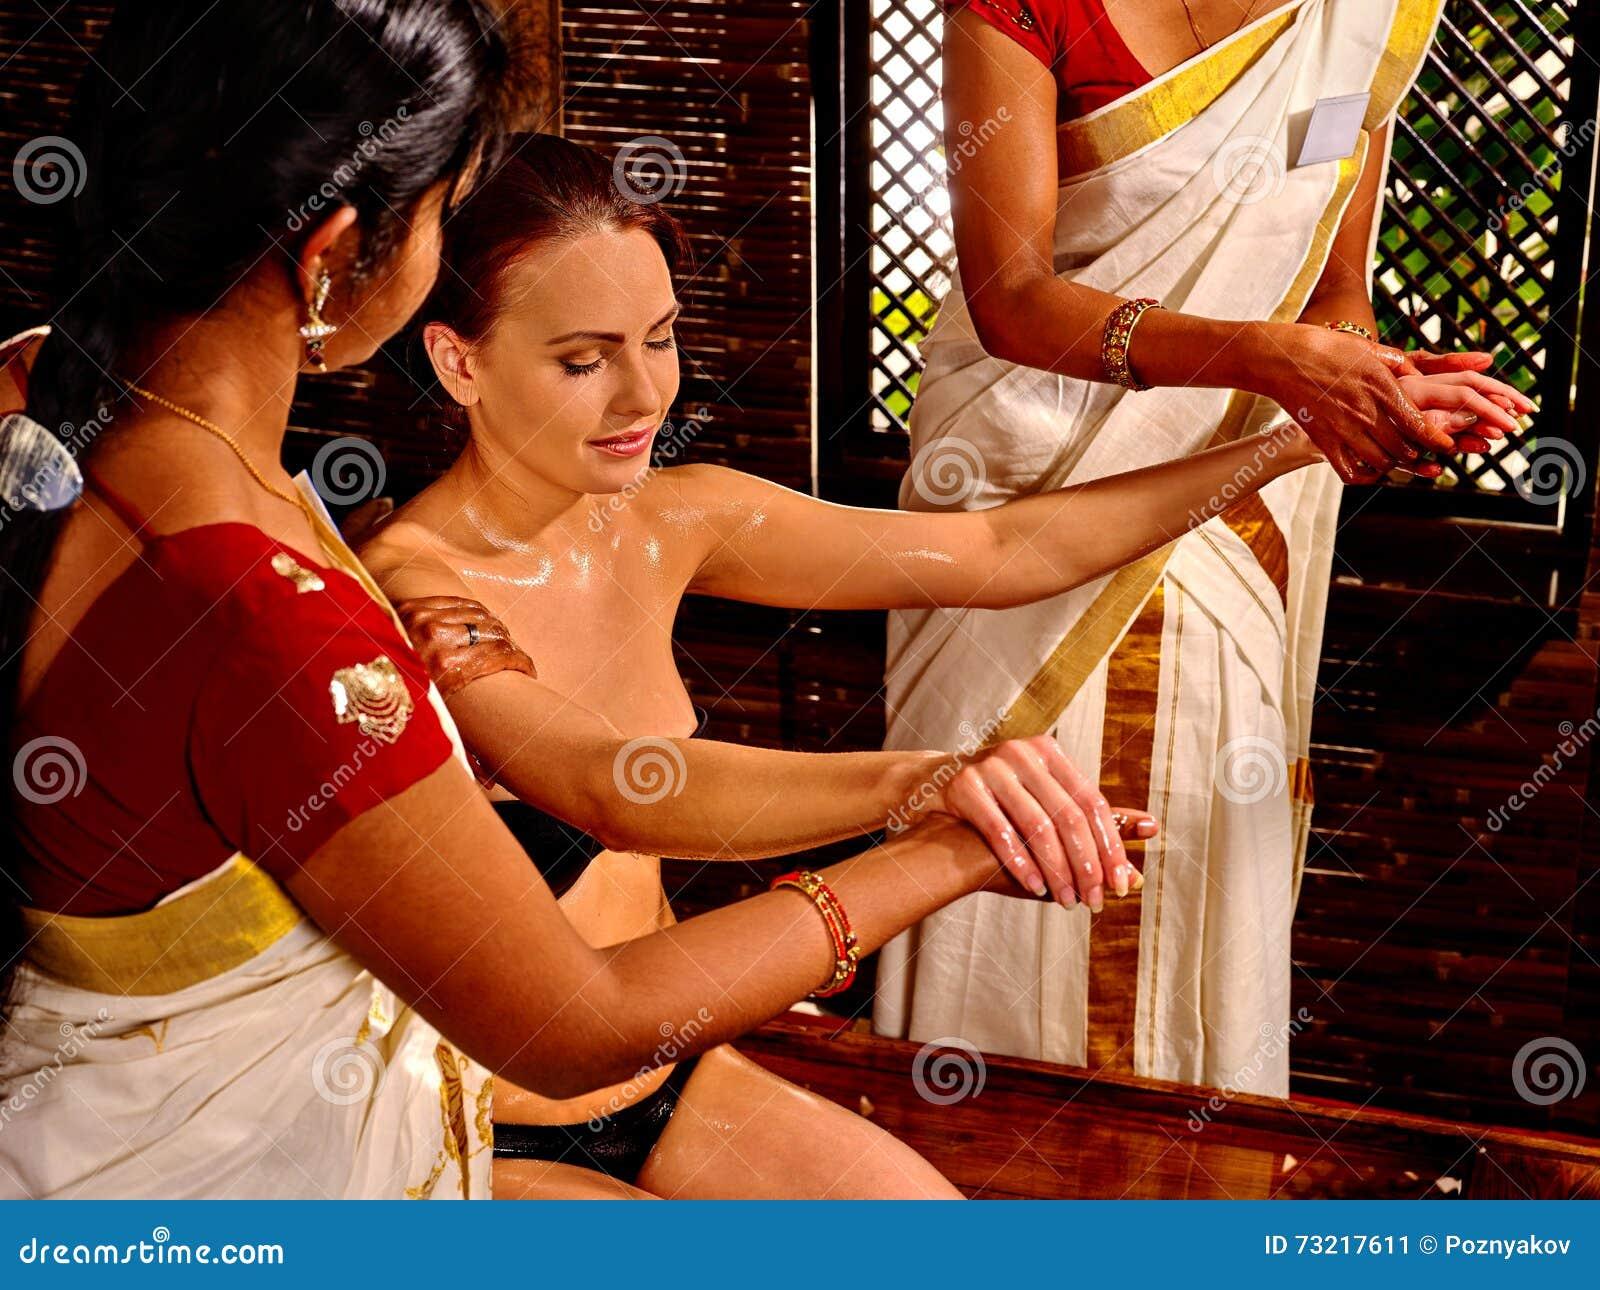 Indian Spa Sex Videos